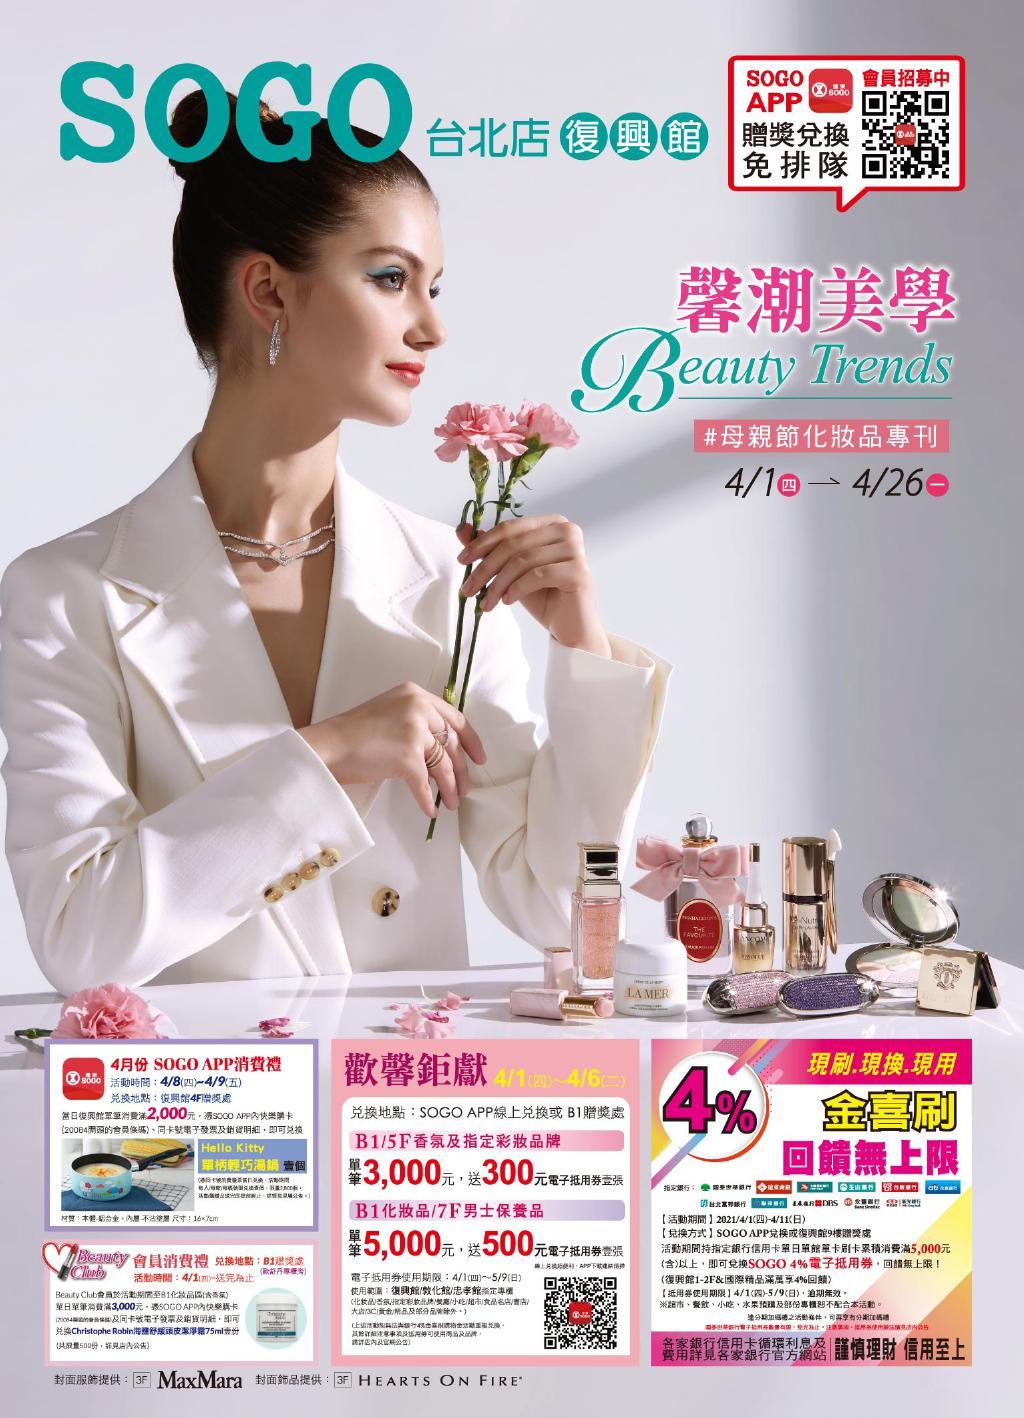 SOGO《台北復興館》「馨潮美學 Beauty Trends #母親節化妝品專刊」【2021/4/26 止】